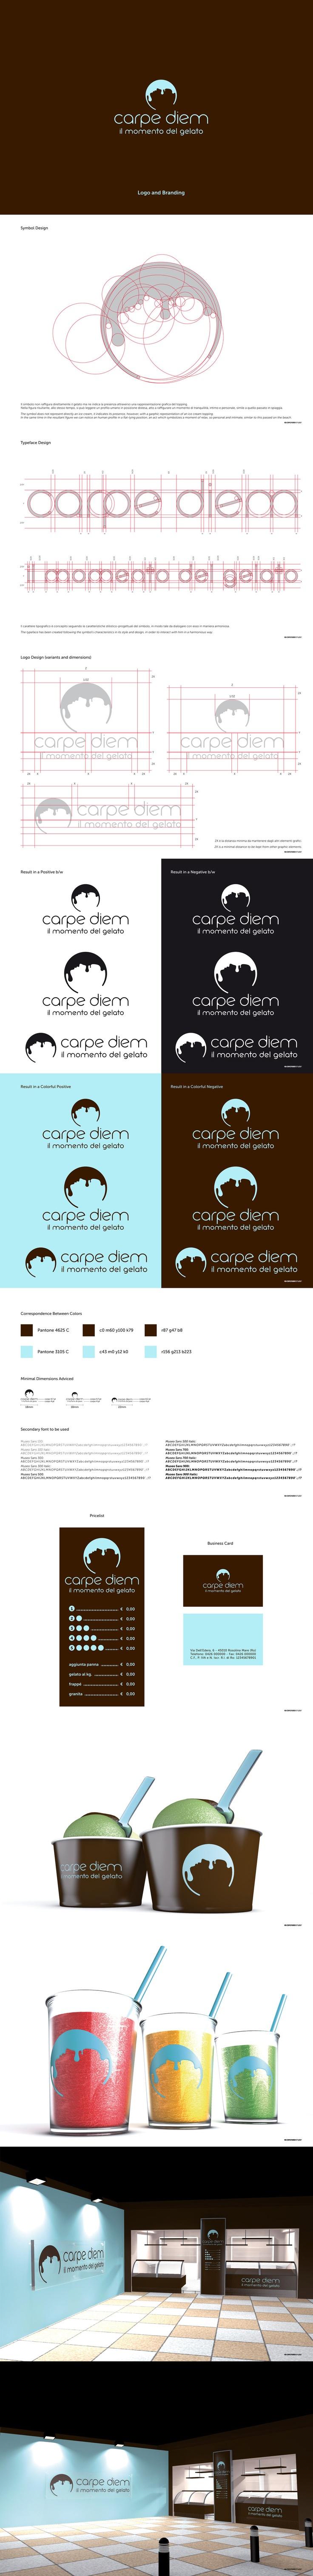 Logo Design and Corporate Identity for Carpe Diem - © Concreate Studio®